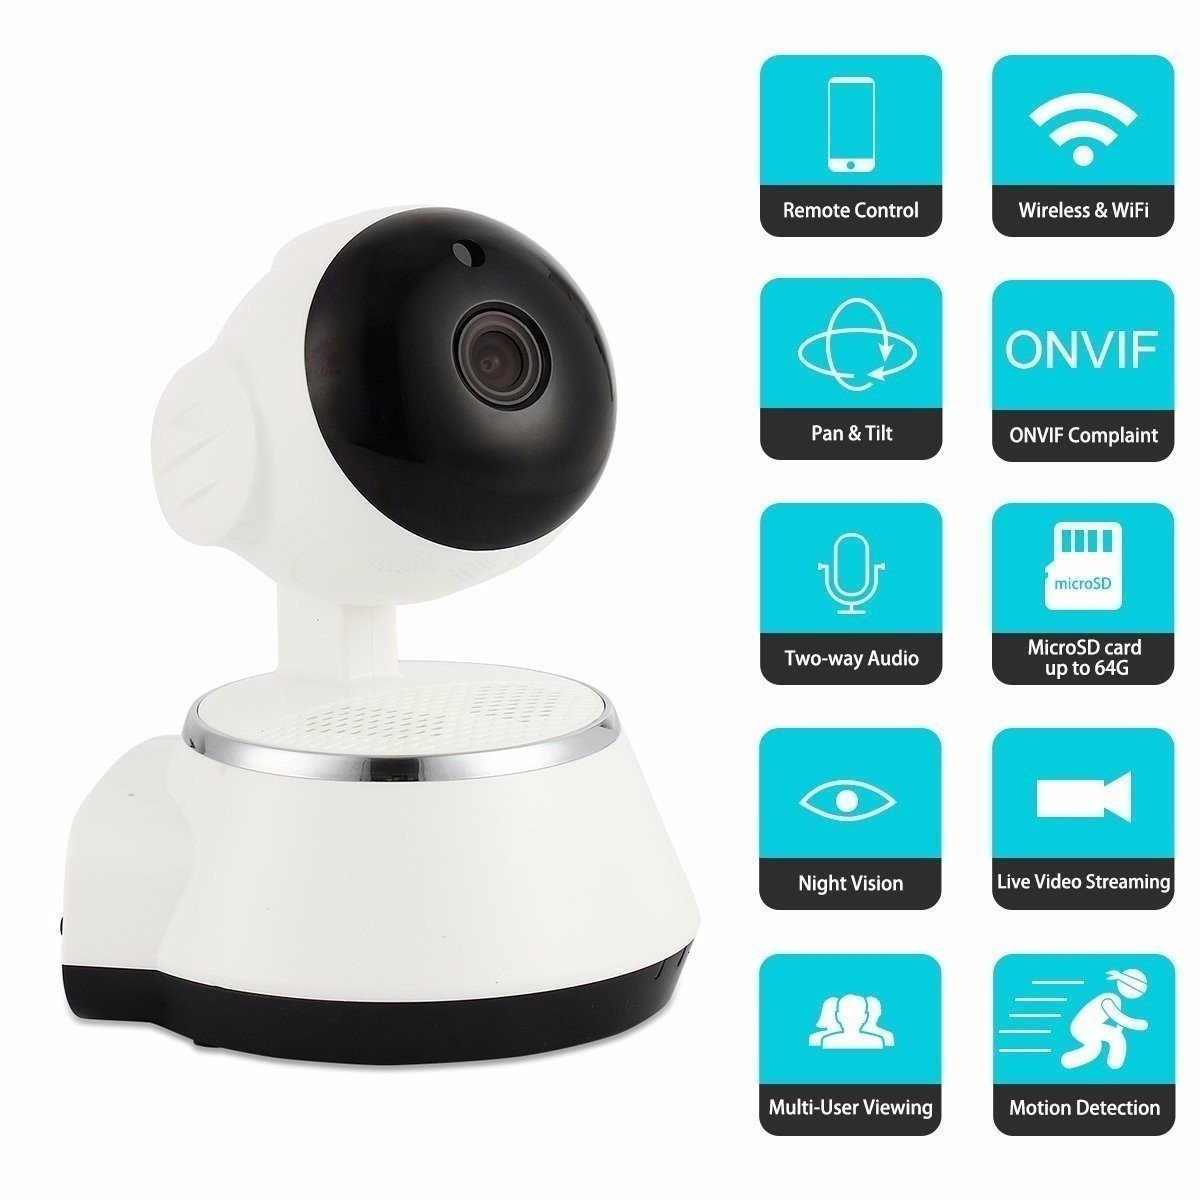 CAMERA DE SURVEILLANCE WIRELESS Wireless Monitor, M.Way Vide Wifi Monitor HD 720P Remote Home Security Camera Night Vision WIFI Webcam - Vendu a des clients avises. (NOT AN IP CAMERA)